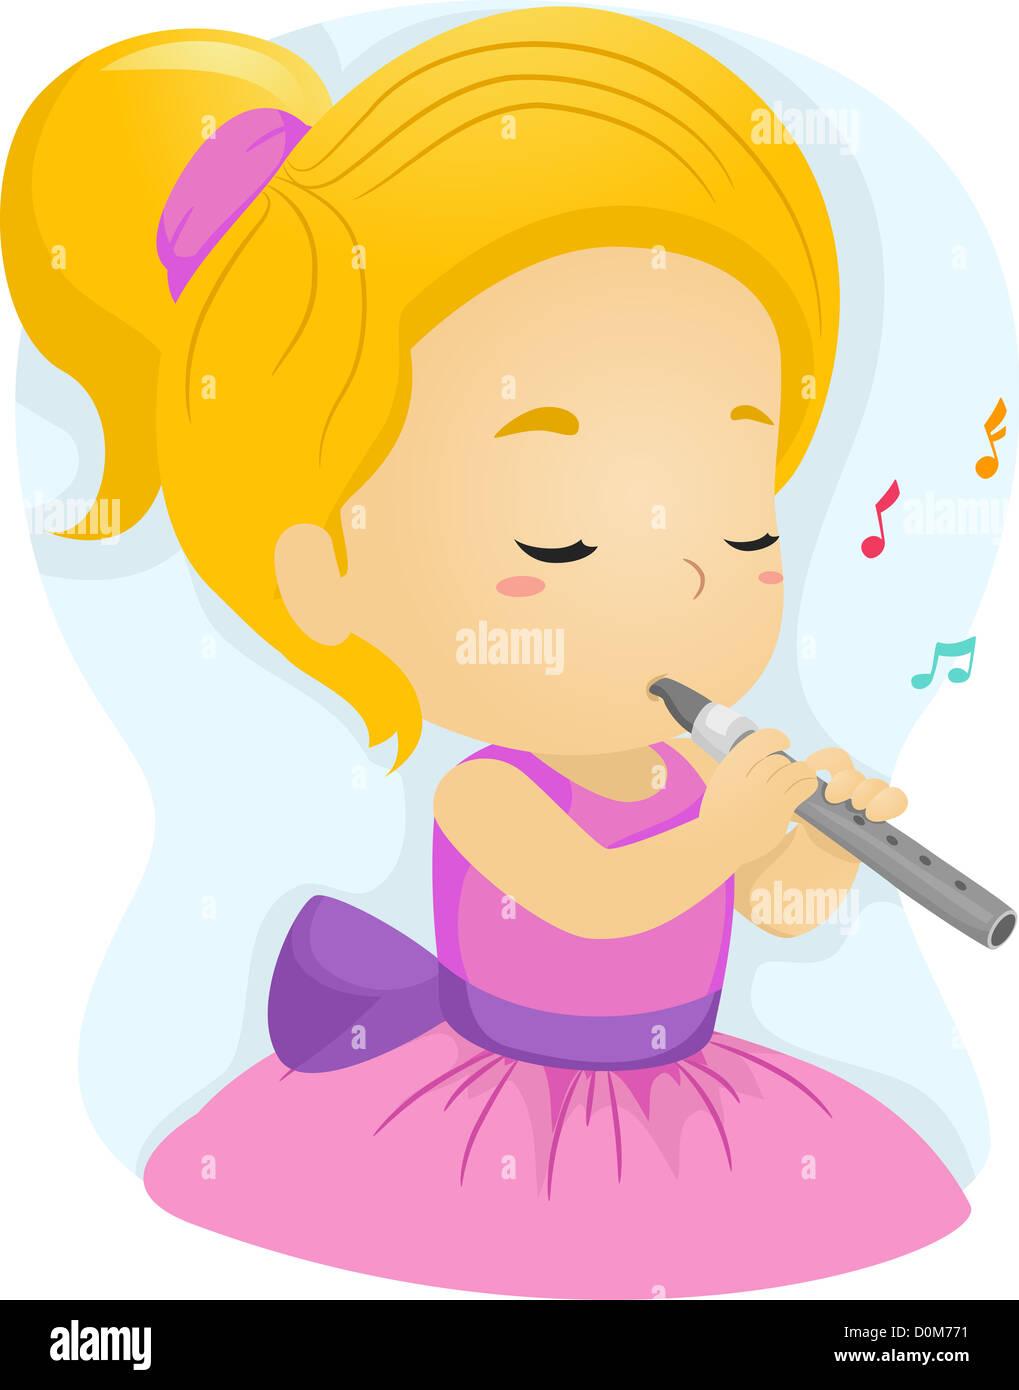 flute musical instrument cartoon stockfotos  flute